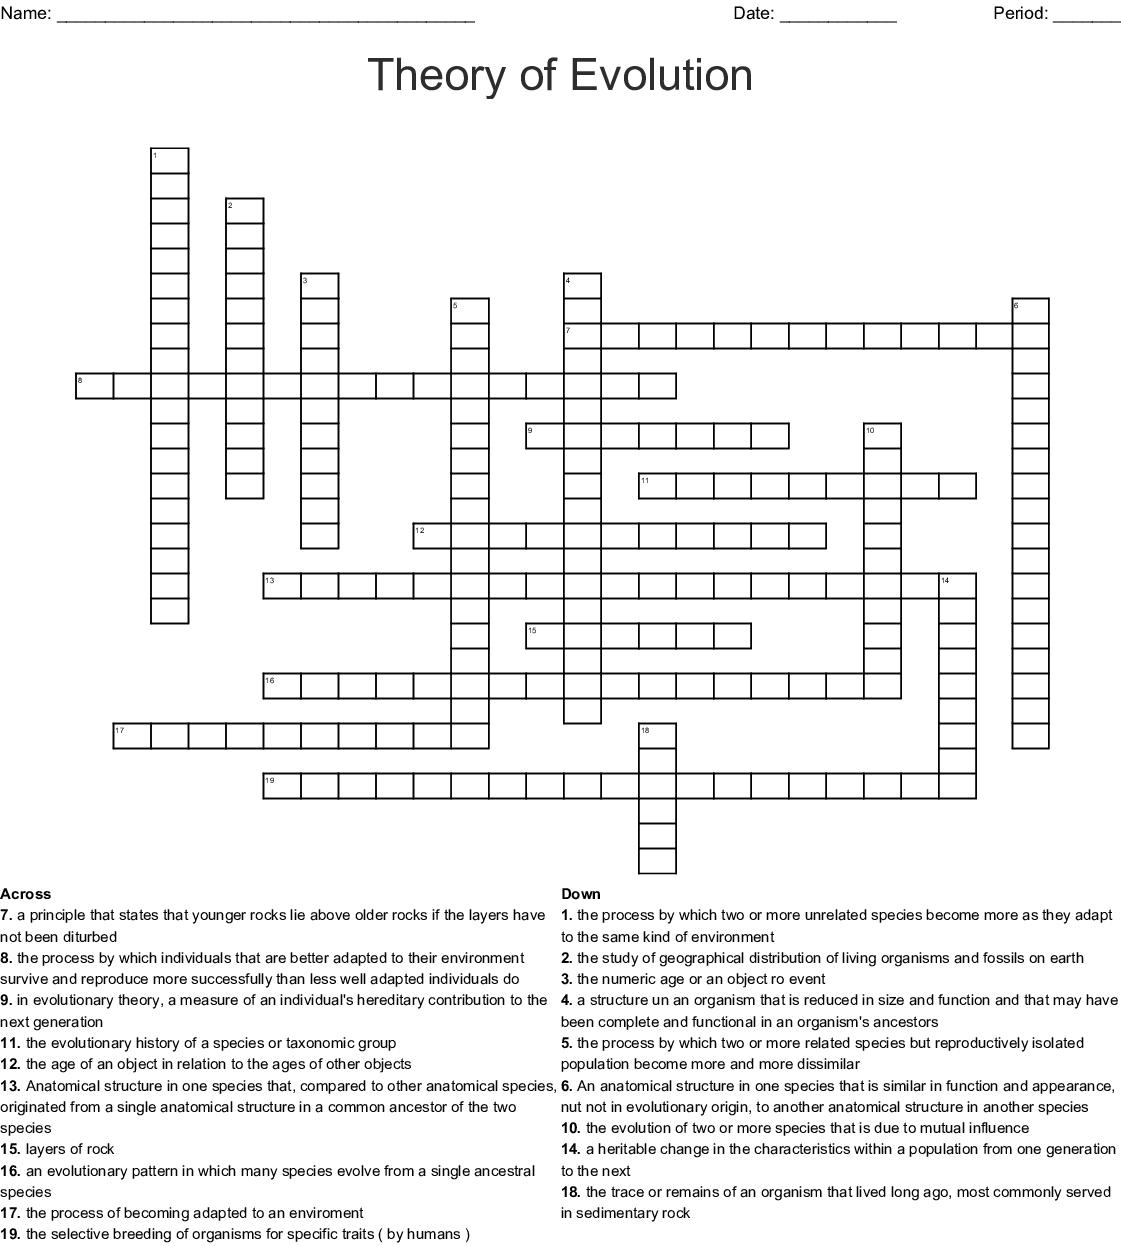 Theory Of Evolution Crossword